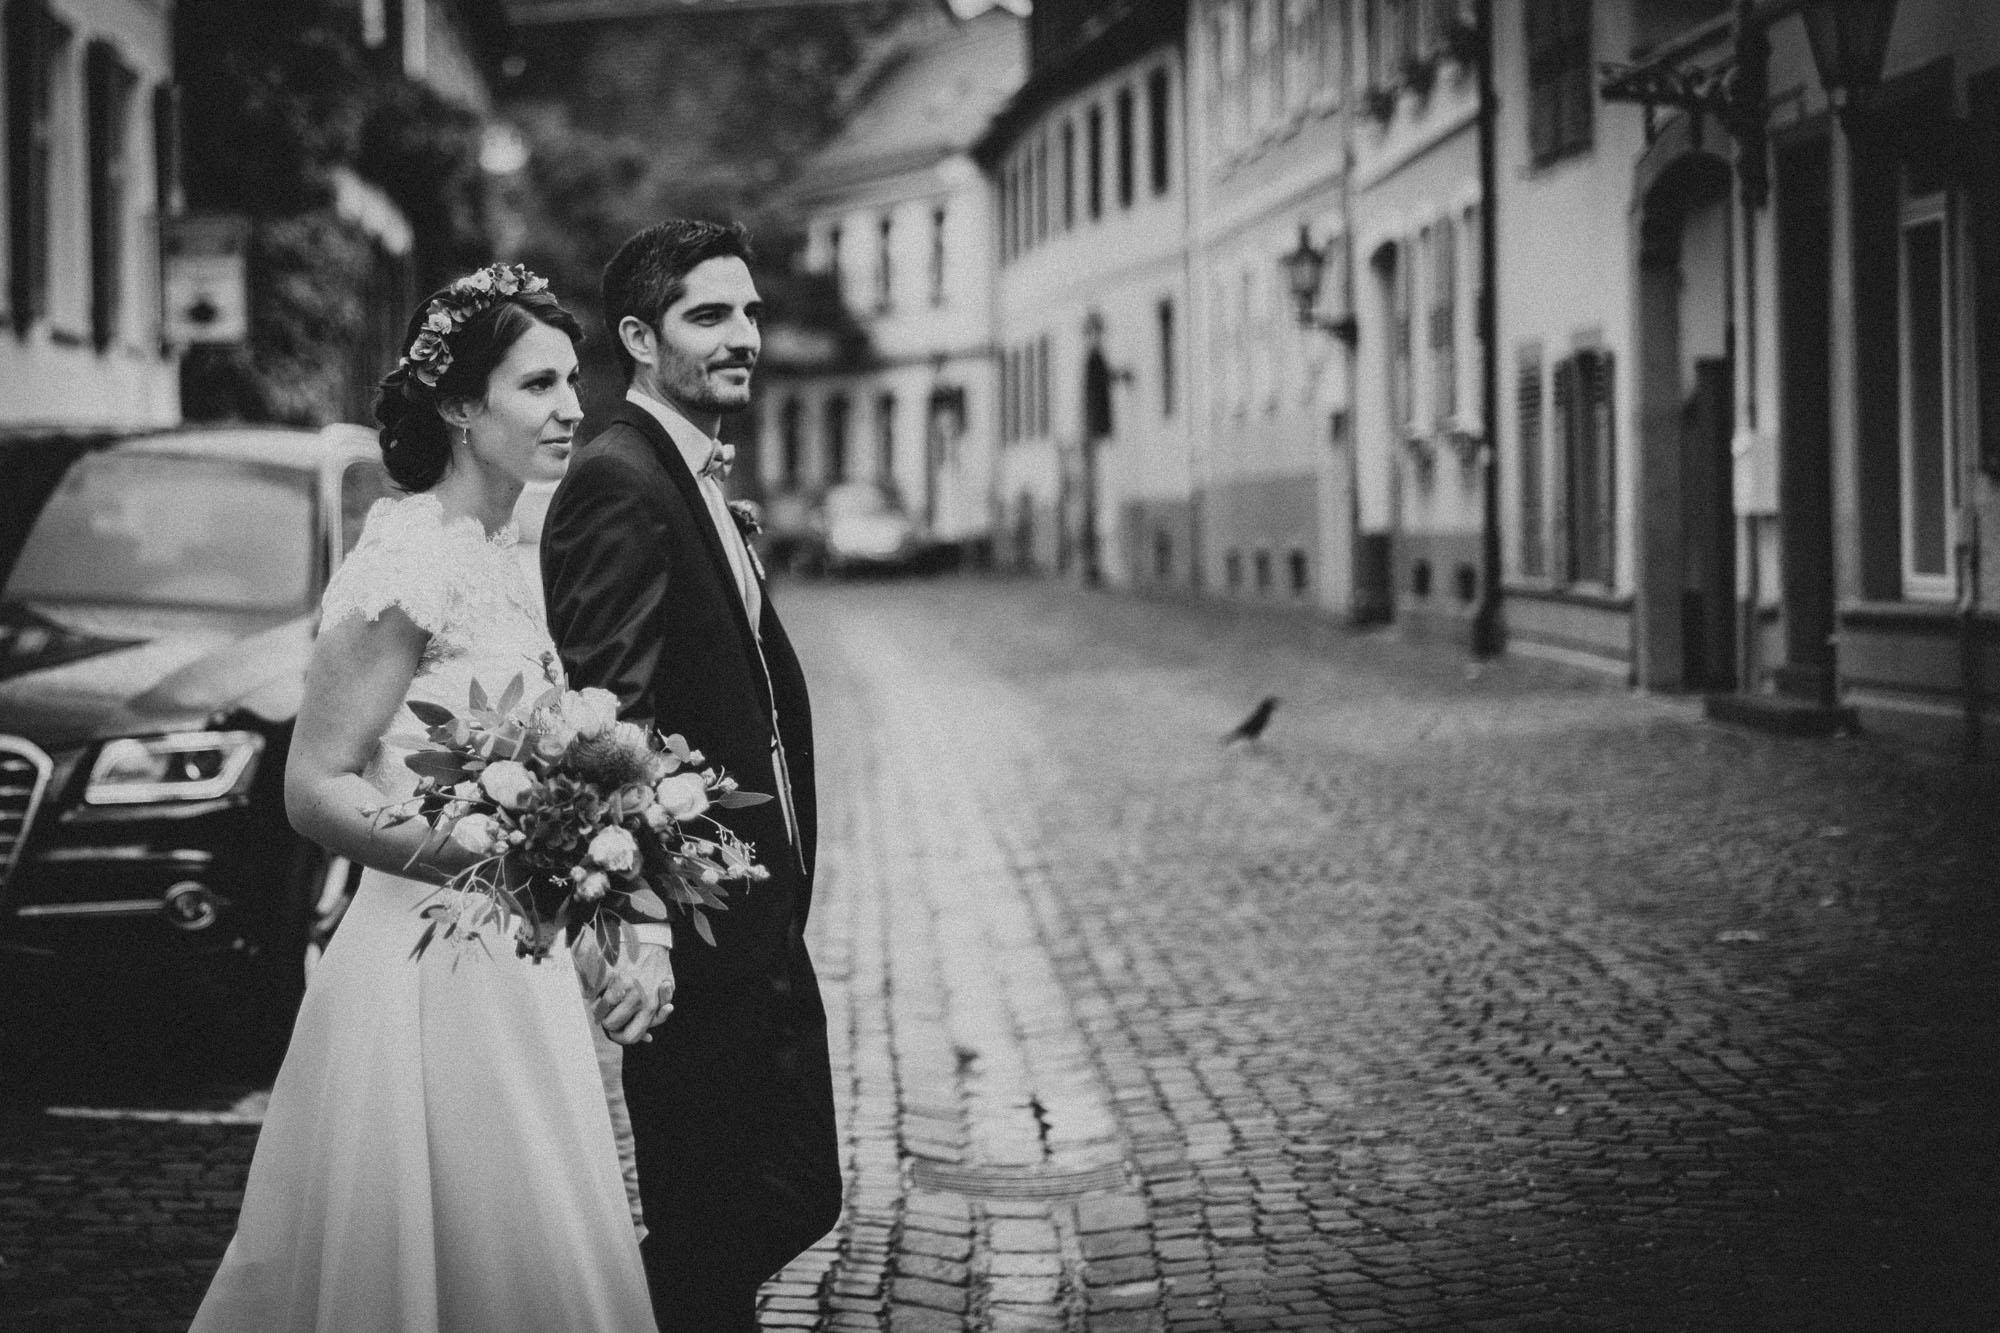 Hochzeitsfotografie-Karlsruhe-Ronja-Flo-10